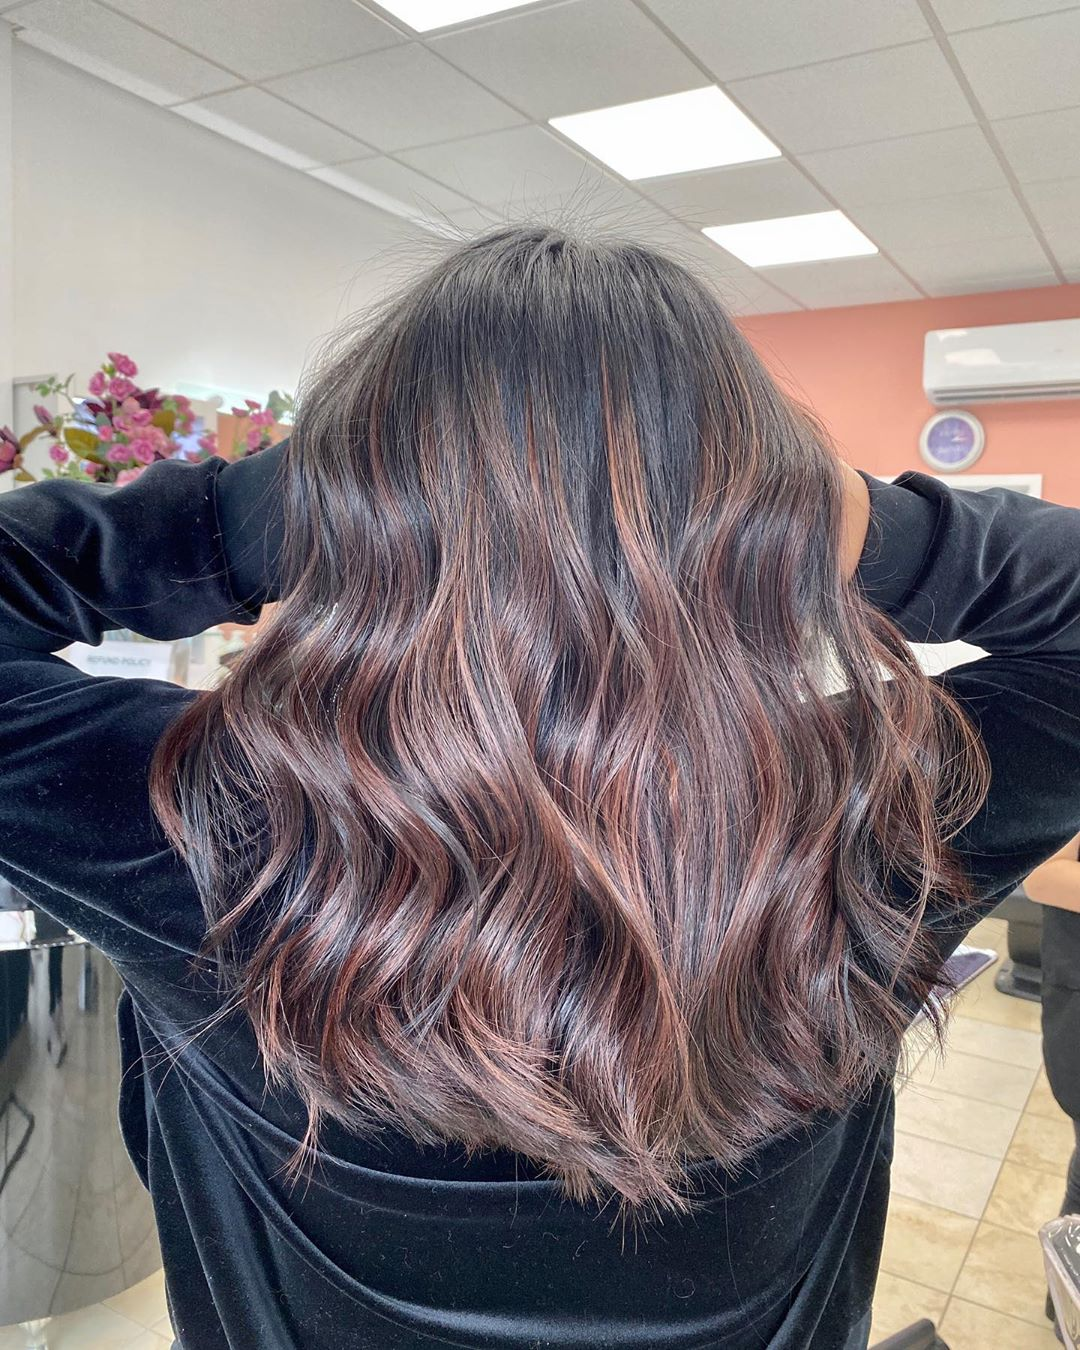 ardona_beauty_salon1